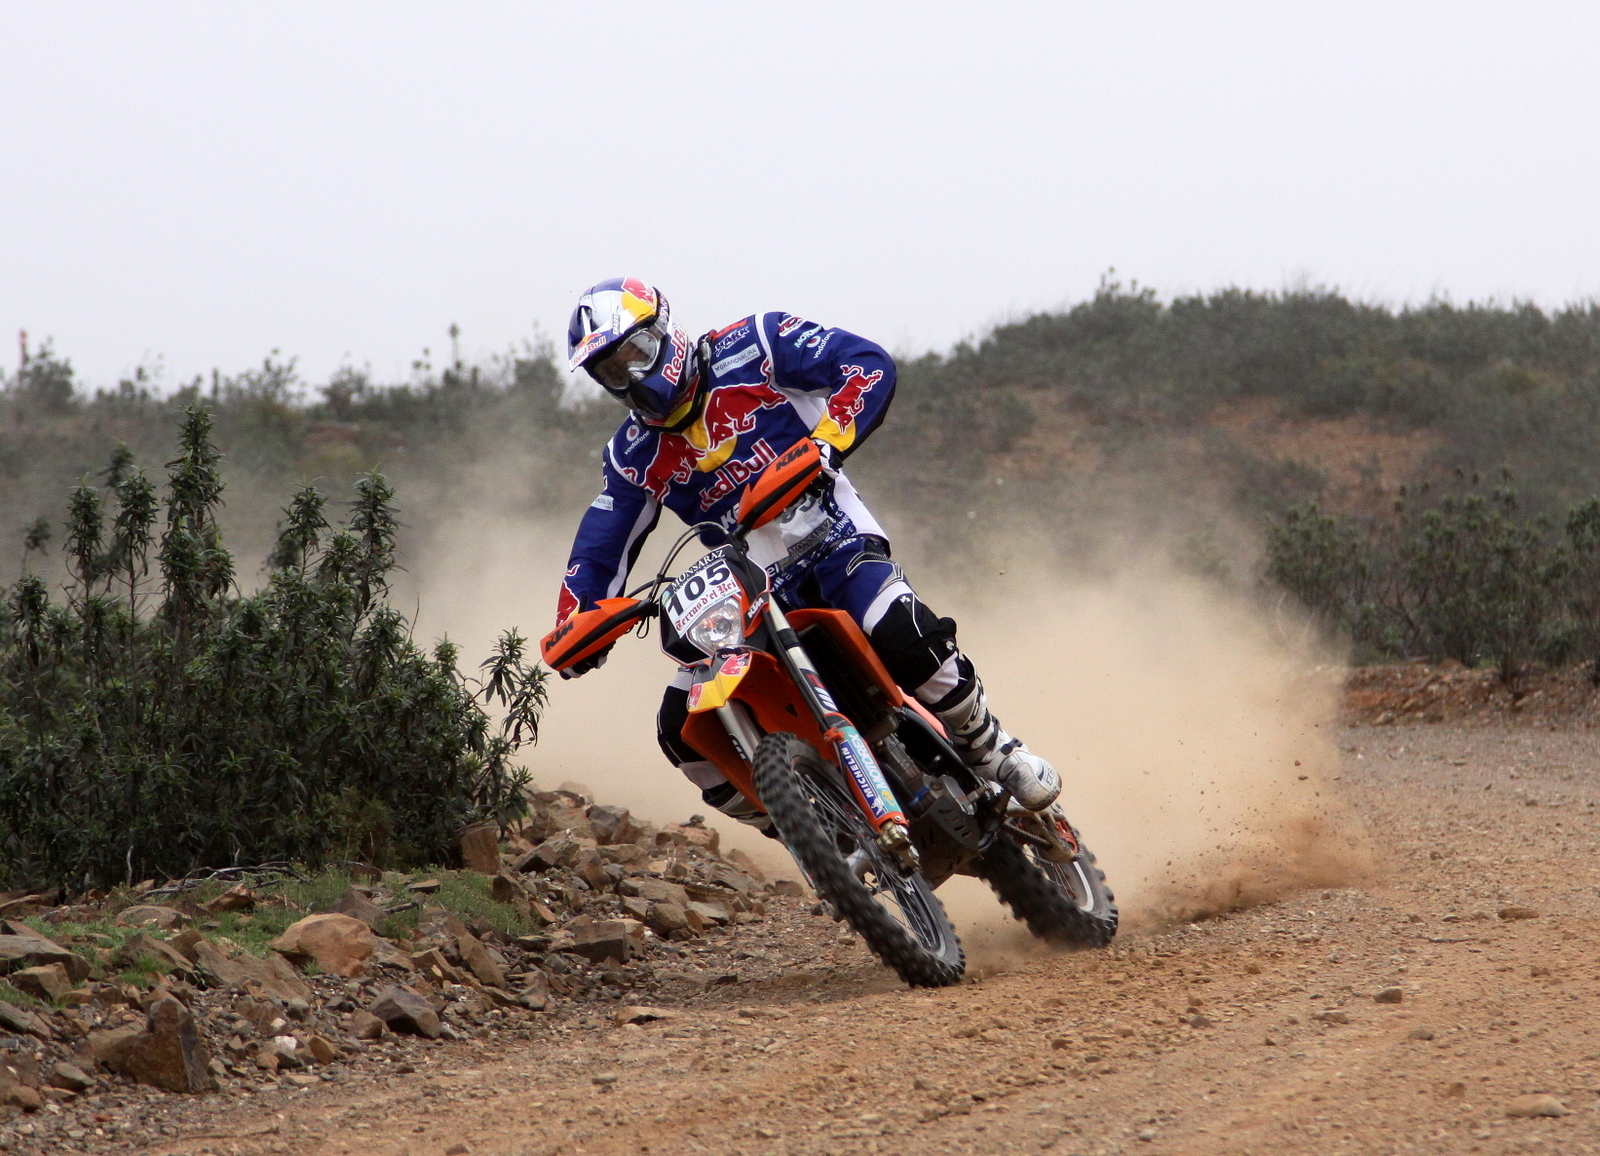 Enduro/Motocross